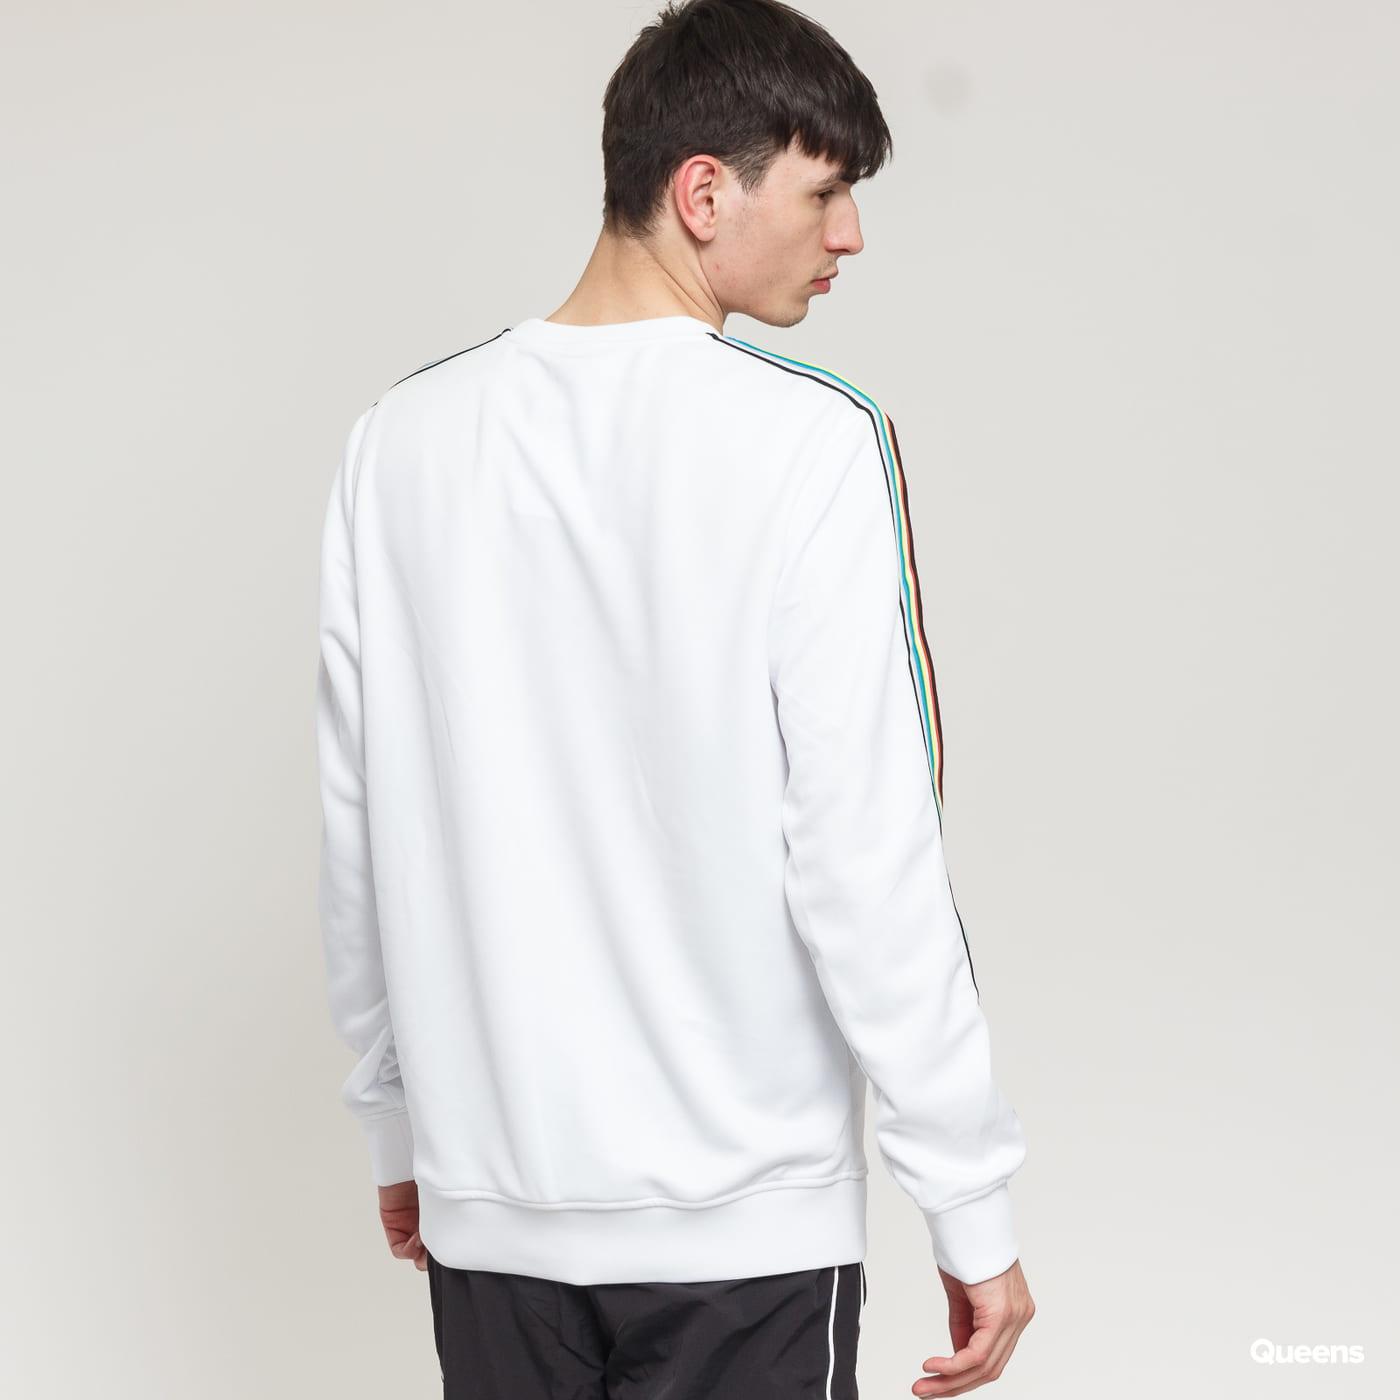 Urban Classics Sleeve Taped Crewneck weiß / multicolor